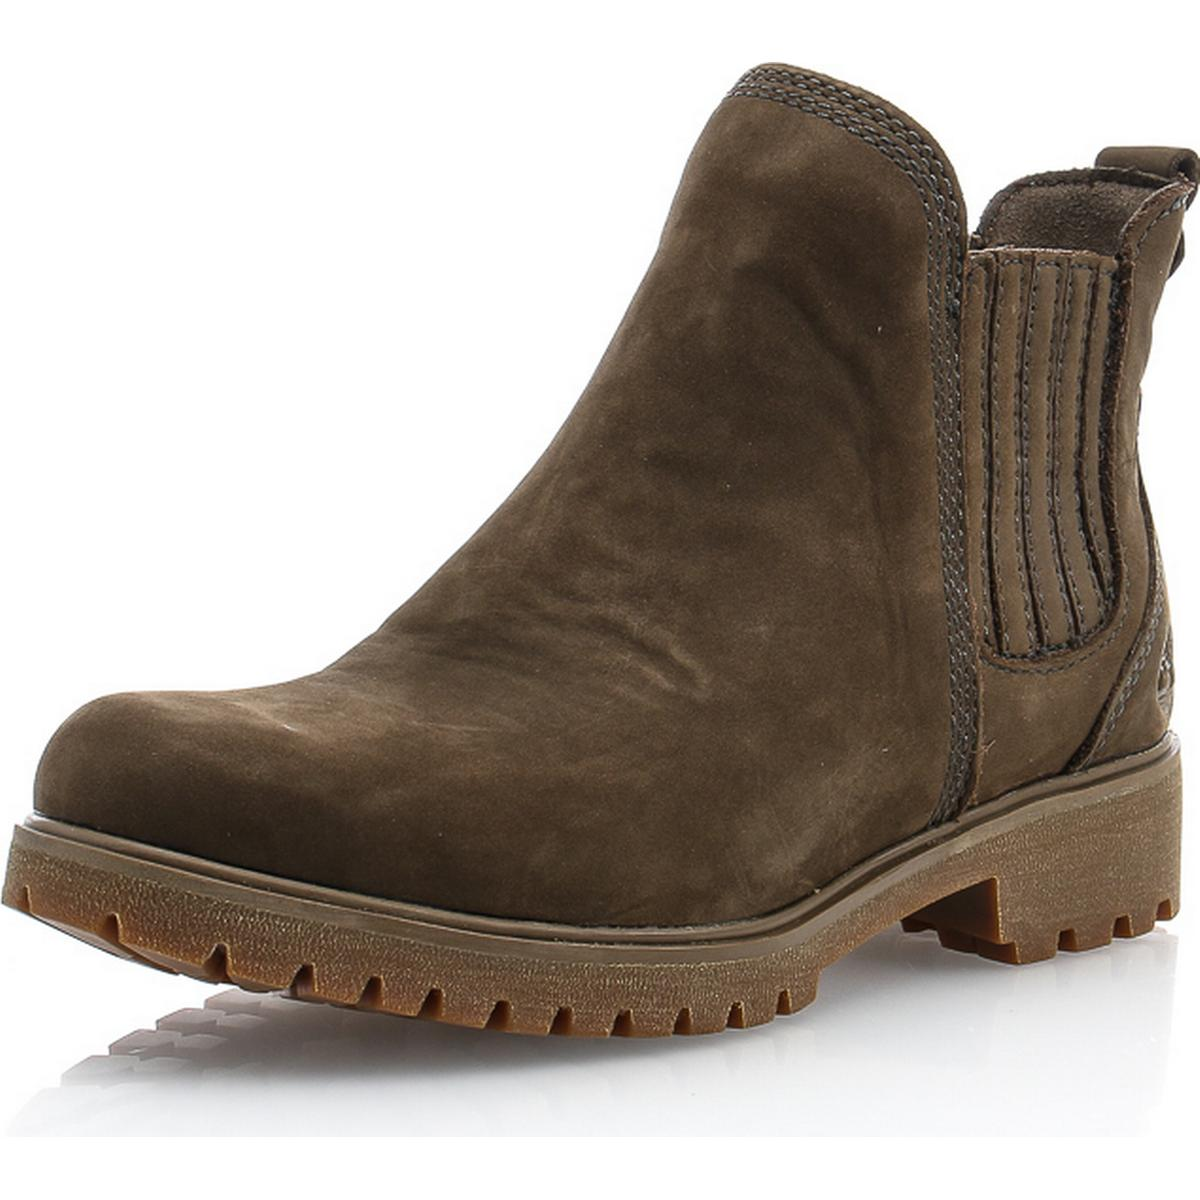 af42ecc0106 Timberland Chelsea Boots - Jämför priser på Jodhpur PriceRunner